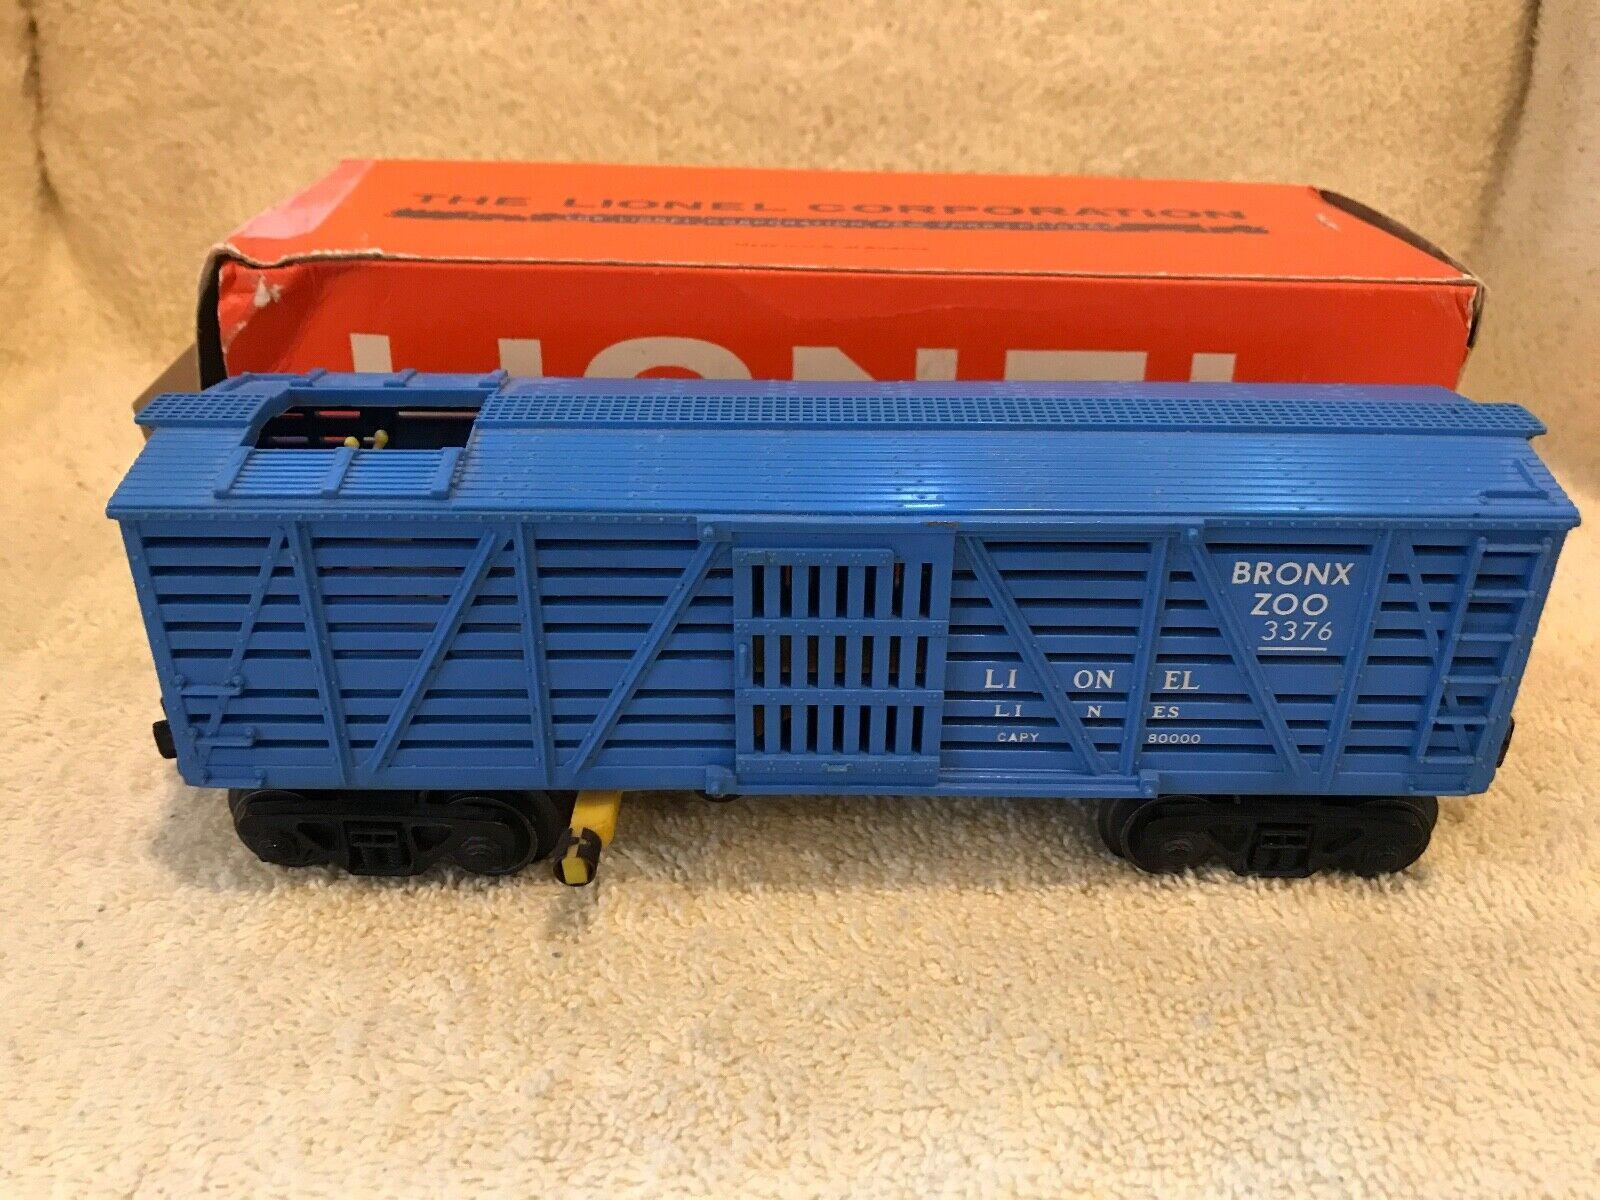 LIONEL 3376 BRONX ZOO GIRAFFE CARS- ORIGIONAL BOX